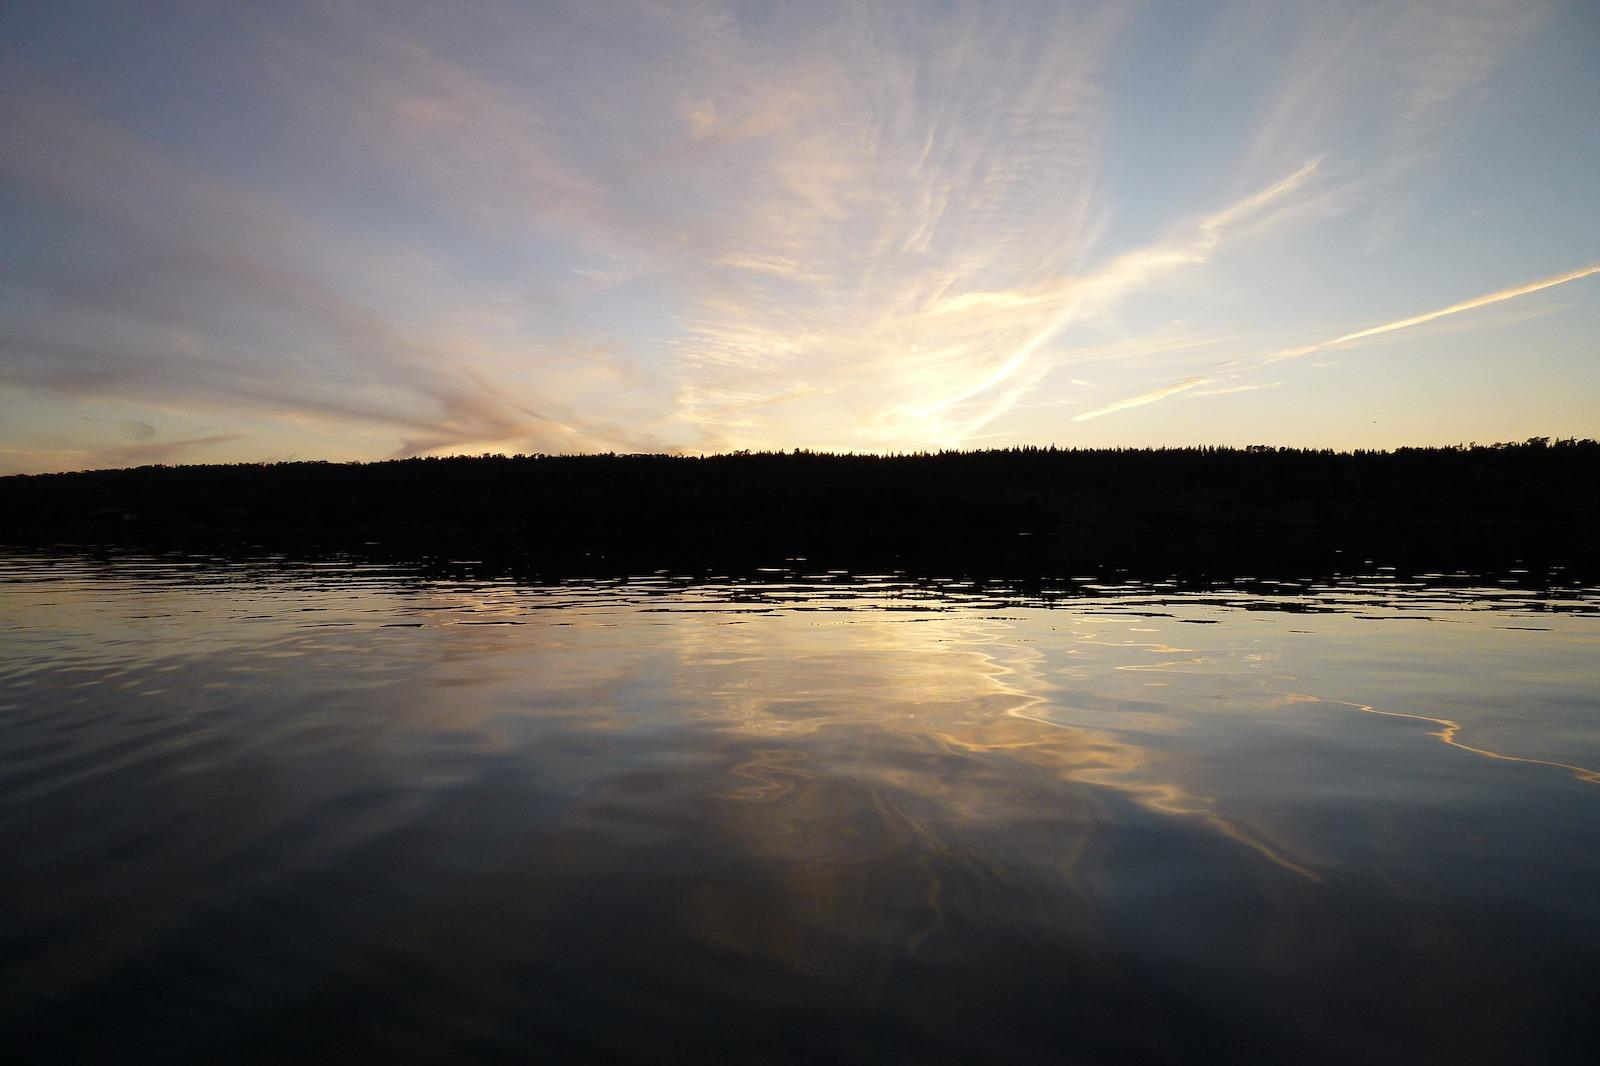 Isle Royale National Park, National Park Service, Lake Superior, Michigan, Mitten state